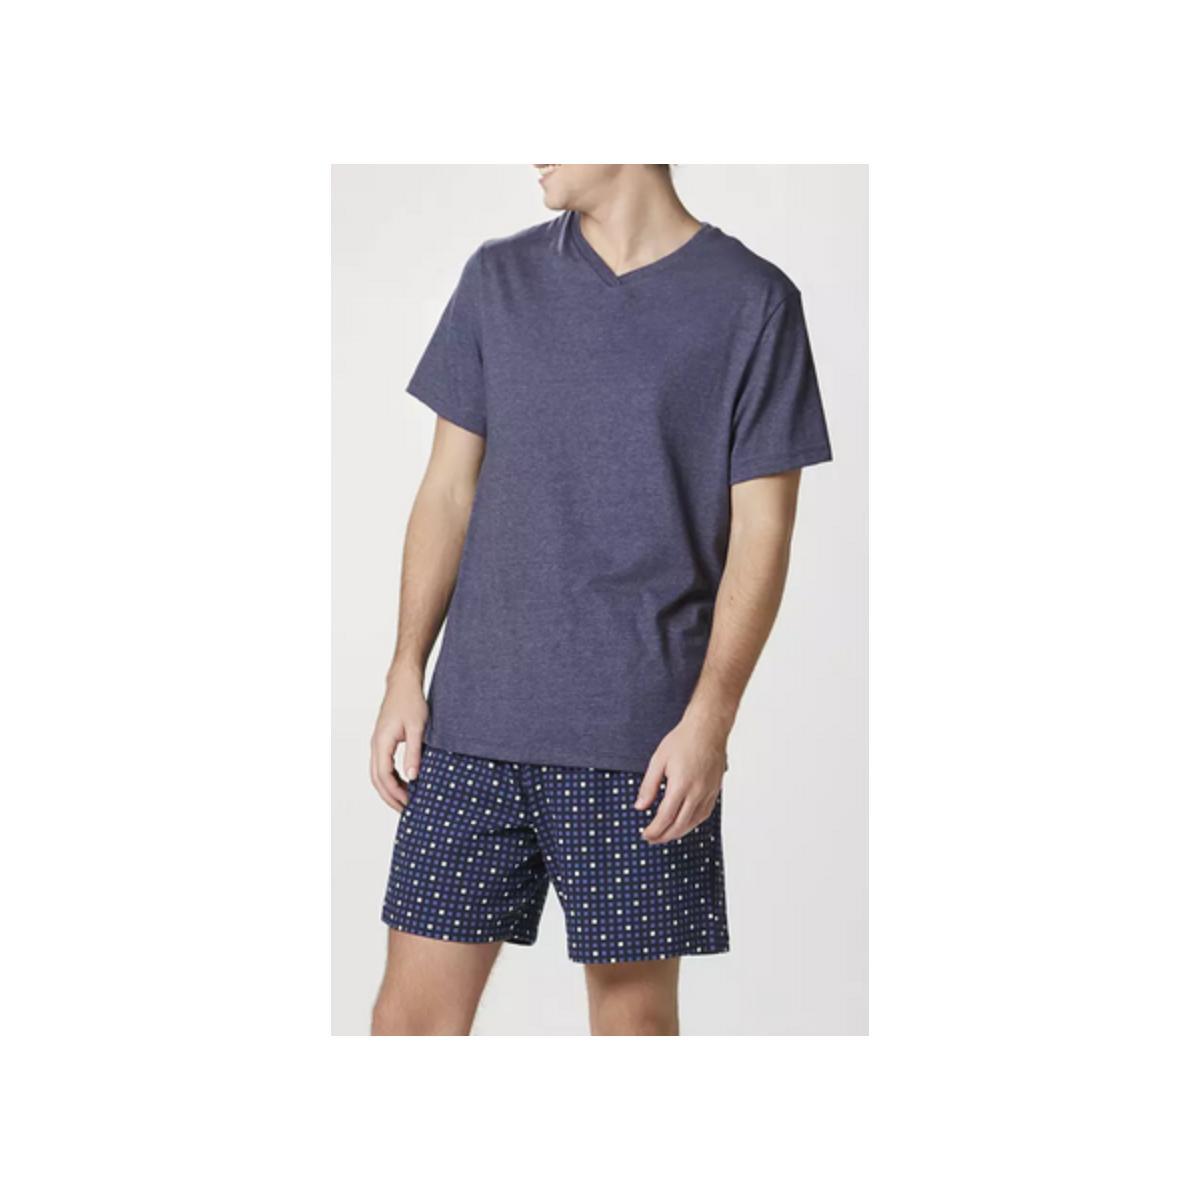 Pijama Masculina Hering 76wx Mf3en  Marinho Estampado